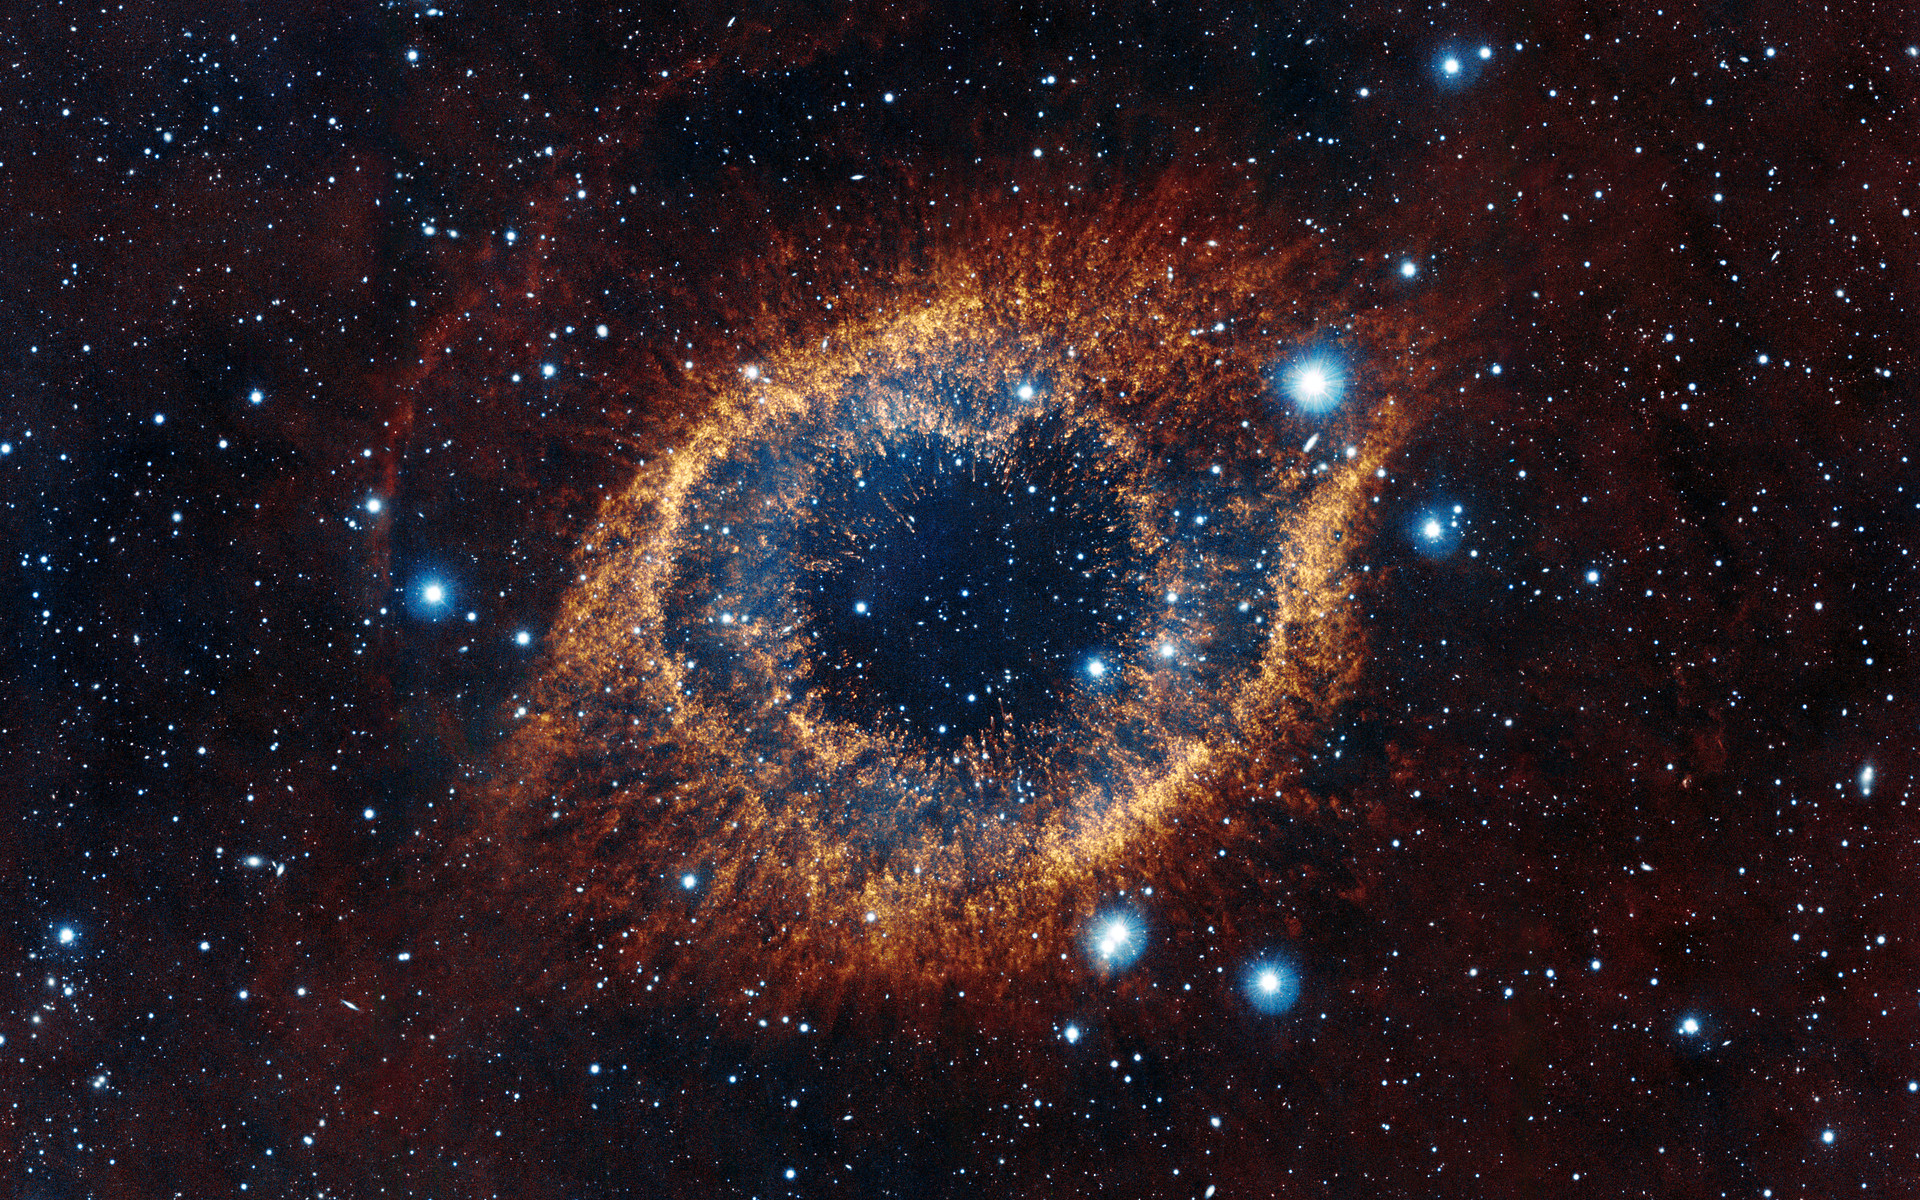 Vista s look at the helix nebula eso for Espacio exterior 4k